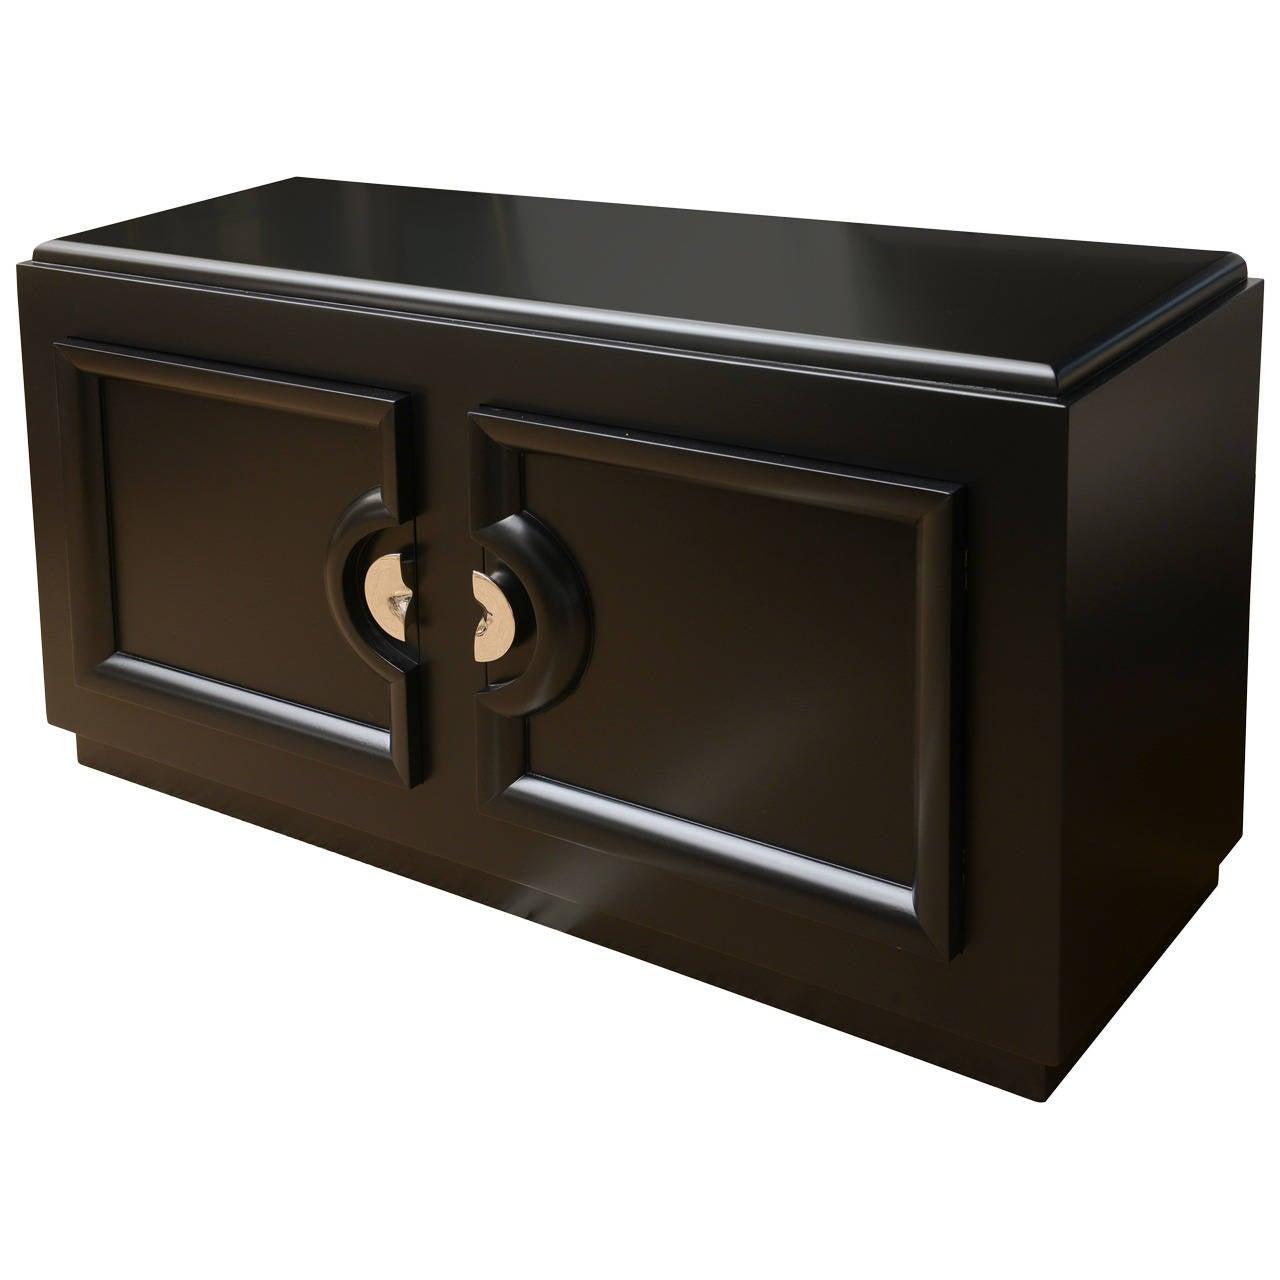 Ebonized Cabinet with Nickel Silver Original Hardware, style of Paul Lazlo